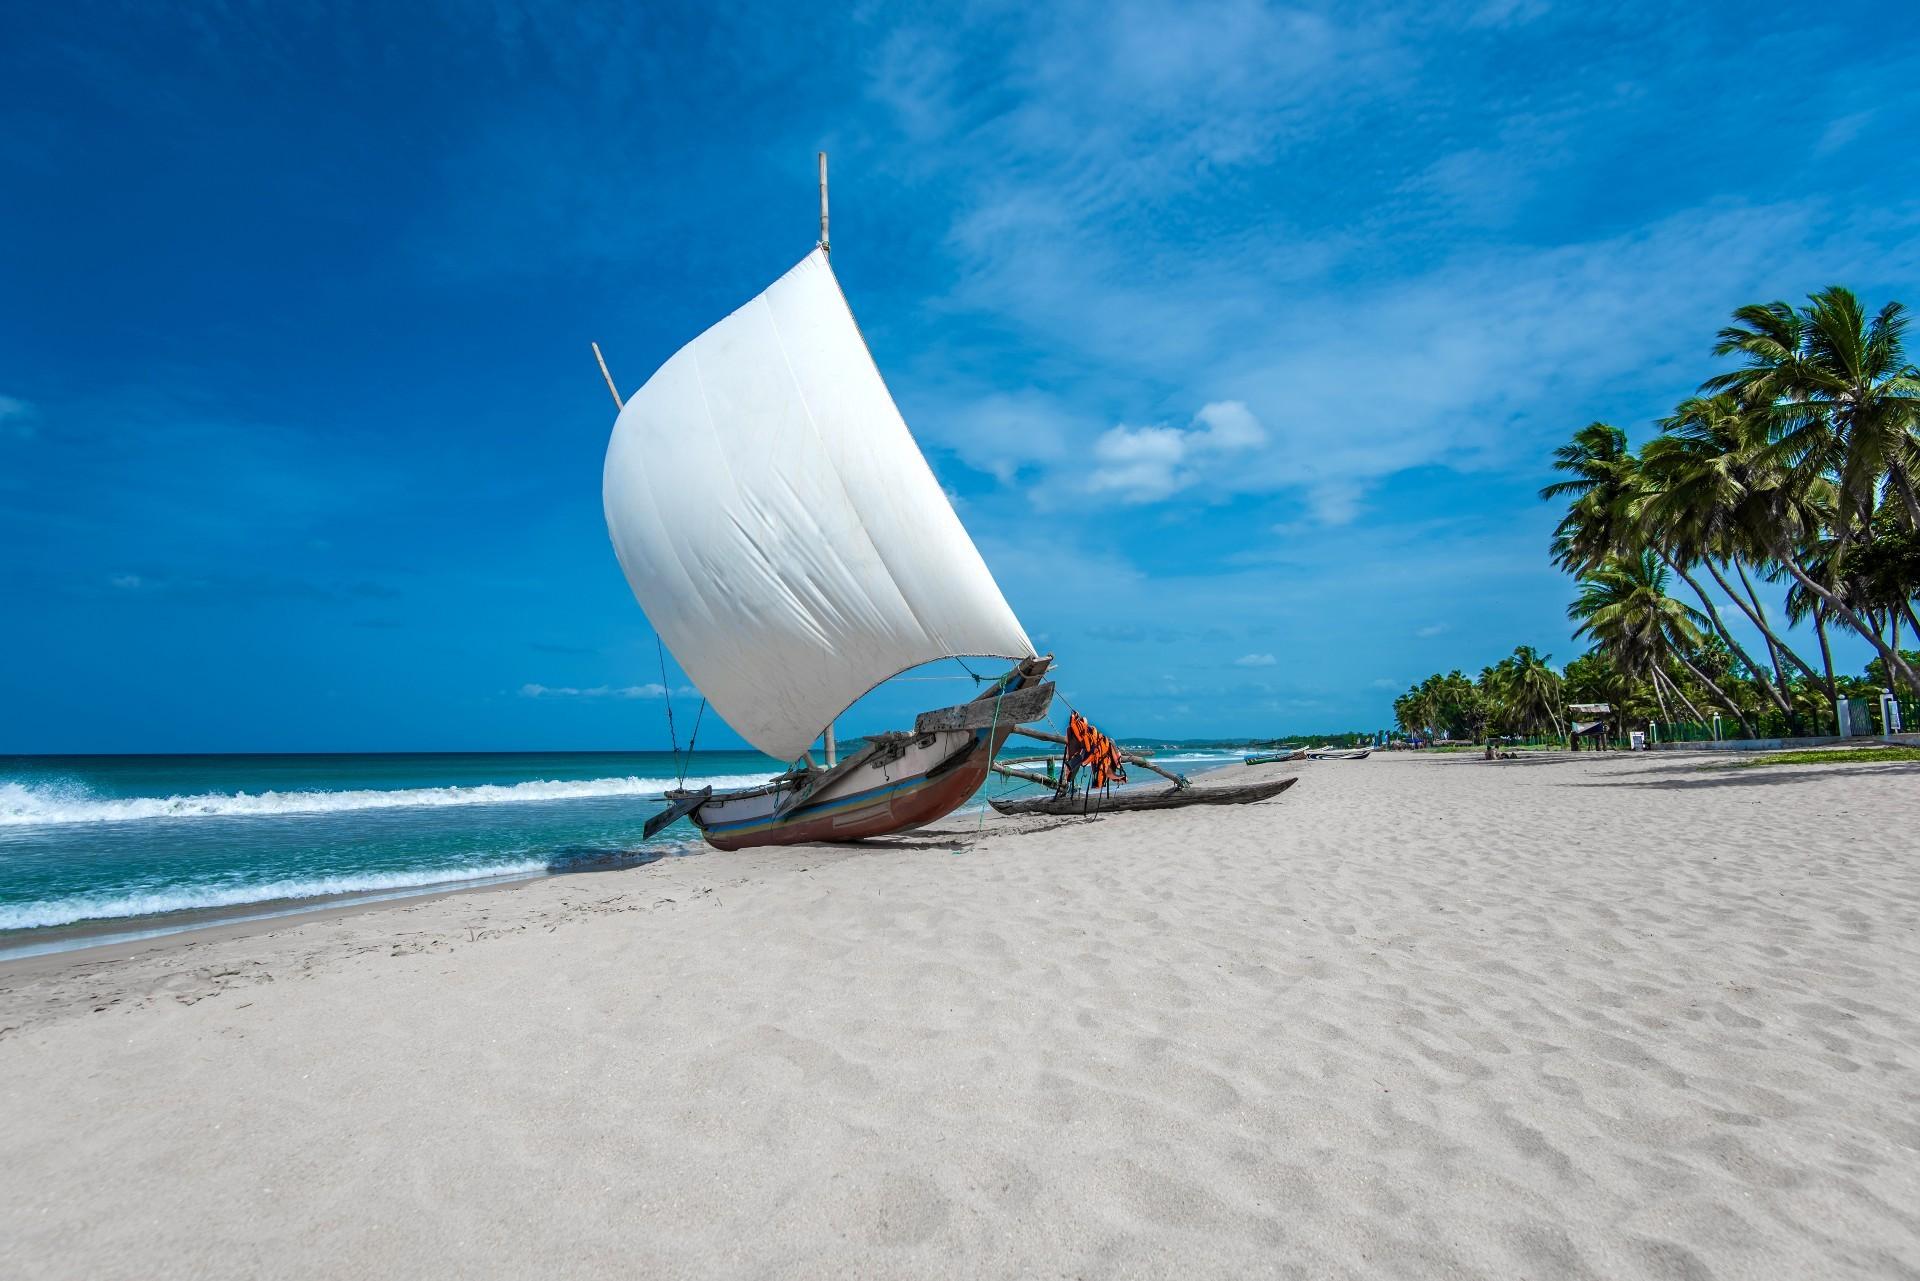 Sri Lanka holidays: boat on beach